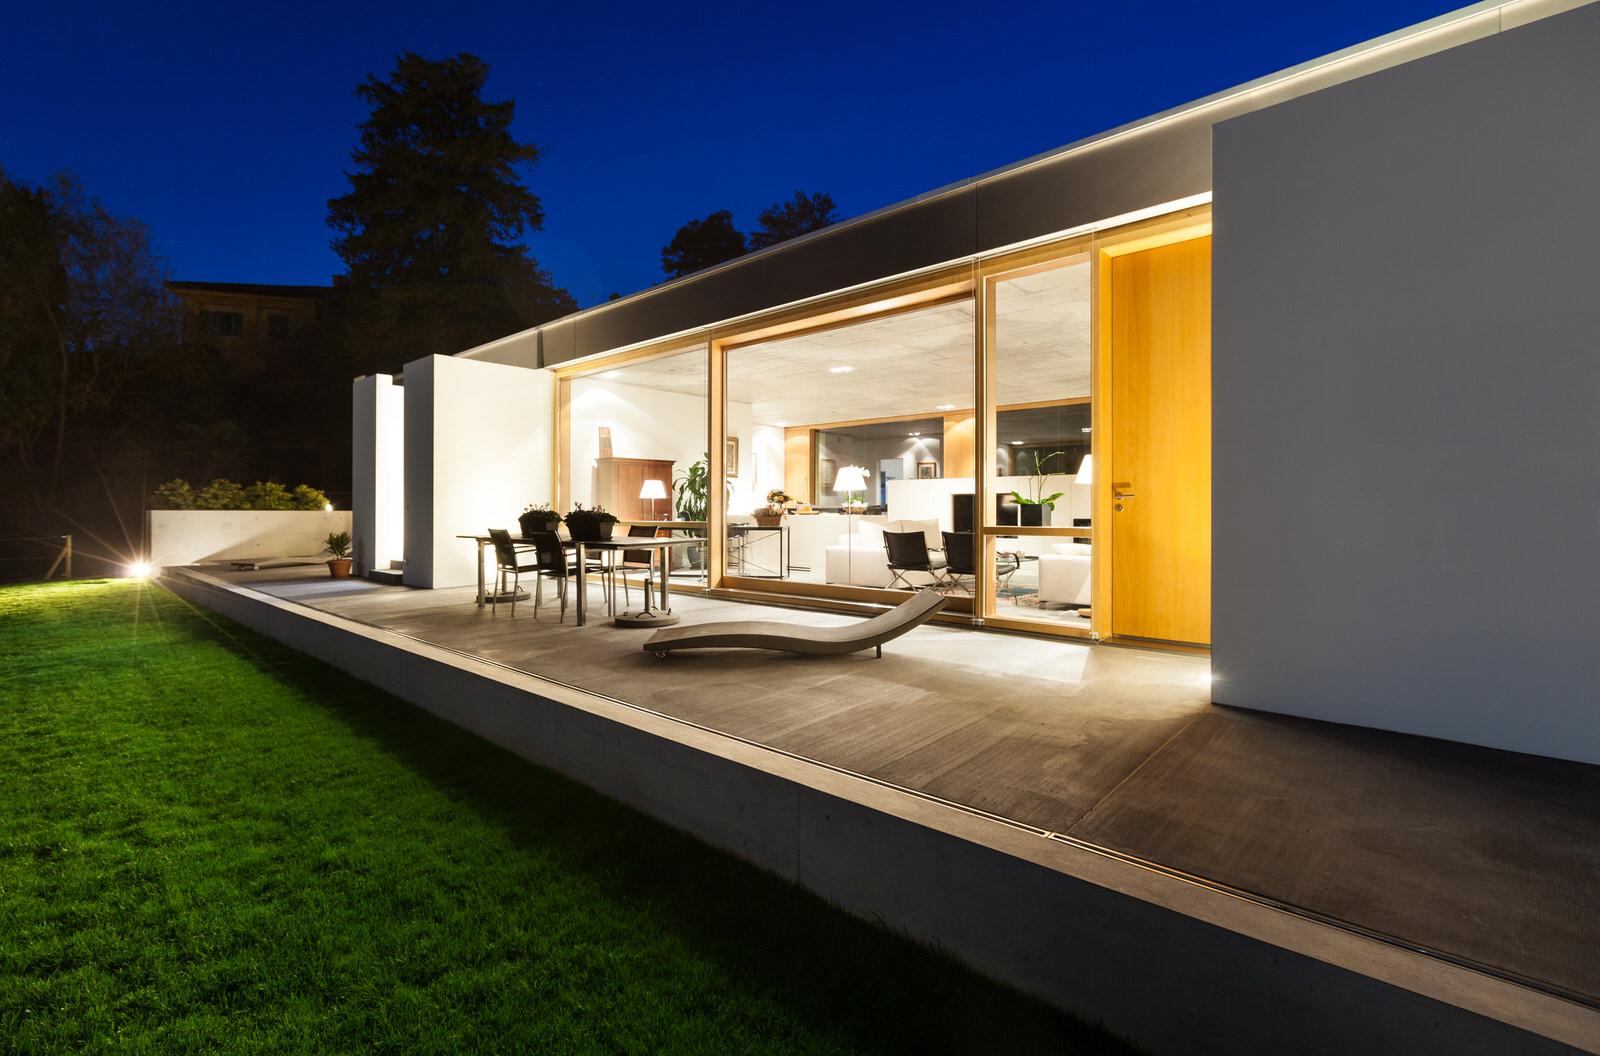 Smart_Home_Lighting_White_Villa_Green_Grass_Deep_Blue_Sunset_Modern_Terrace_White_Kitchen